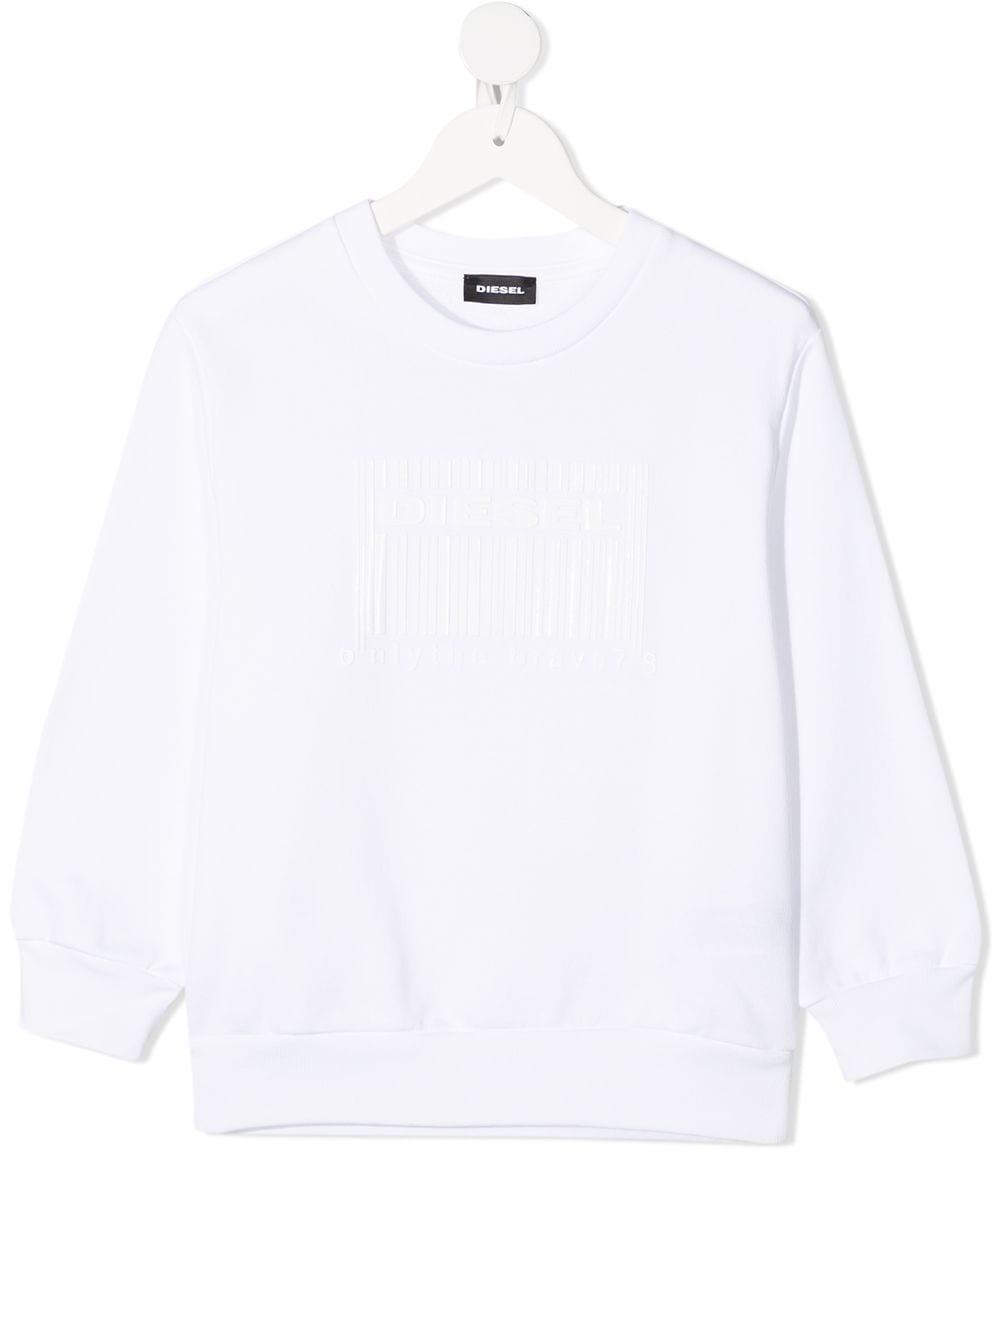 Sweatshirt Diesel kids DIESEL KIDS | -108764232 | J0004400YI8K100